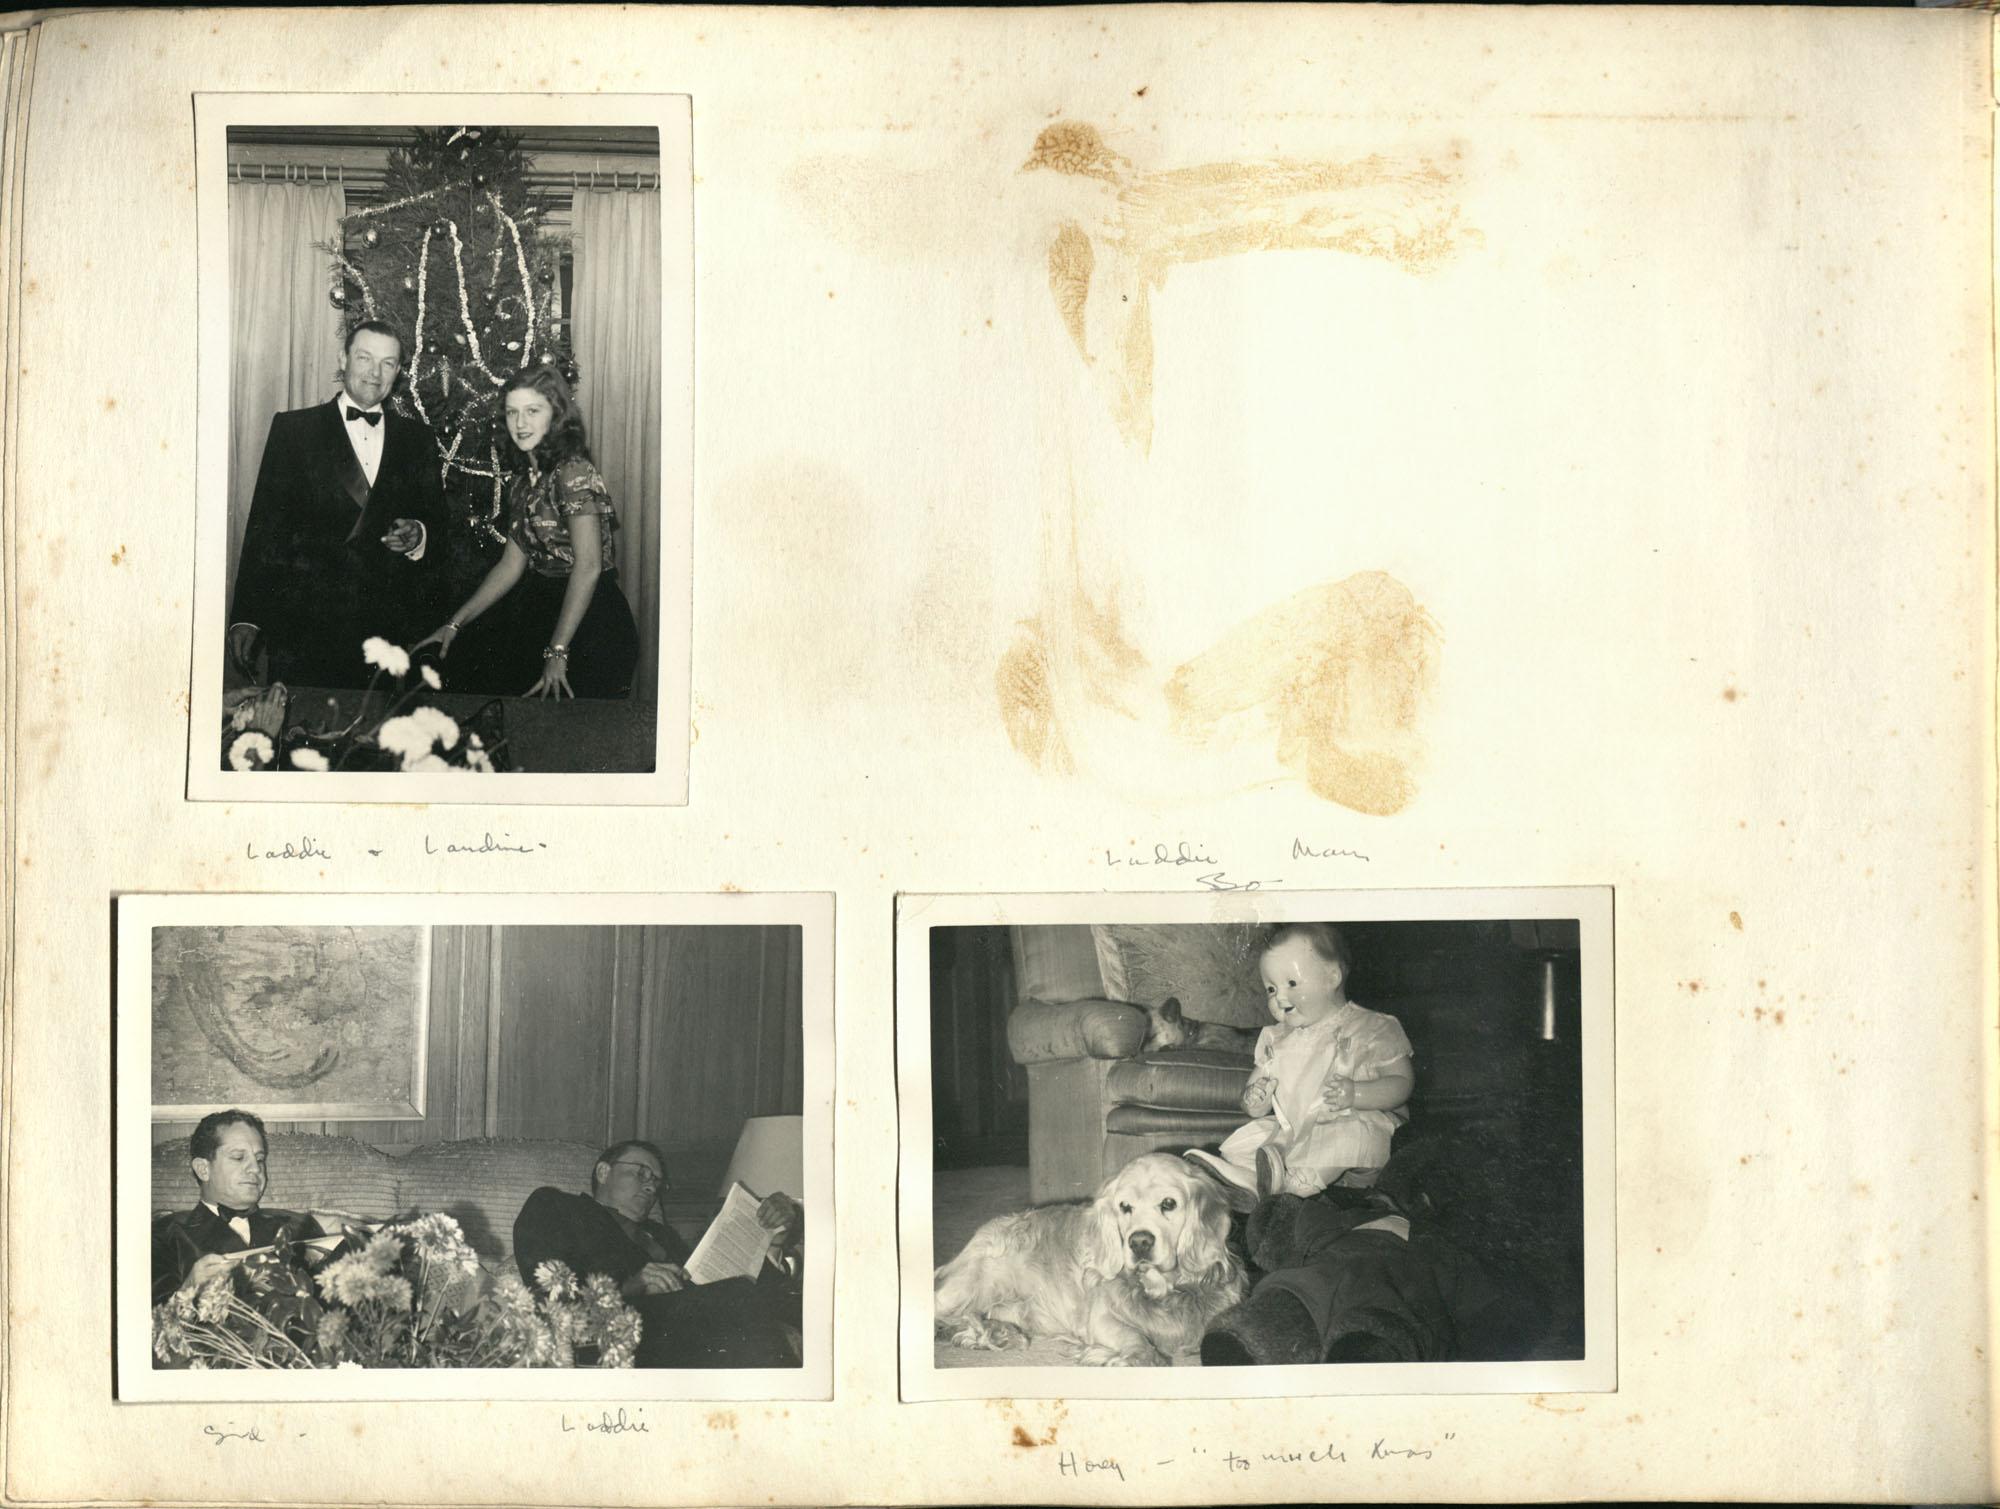 Medway Plantation Photograph Album, 1949, page 124